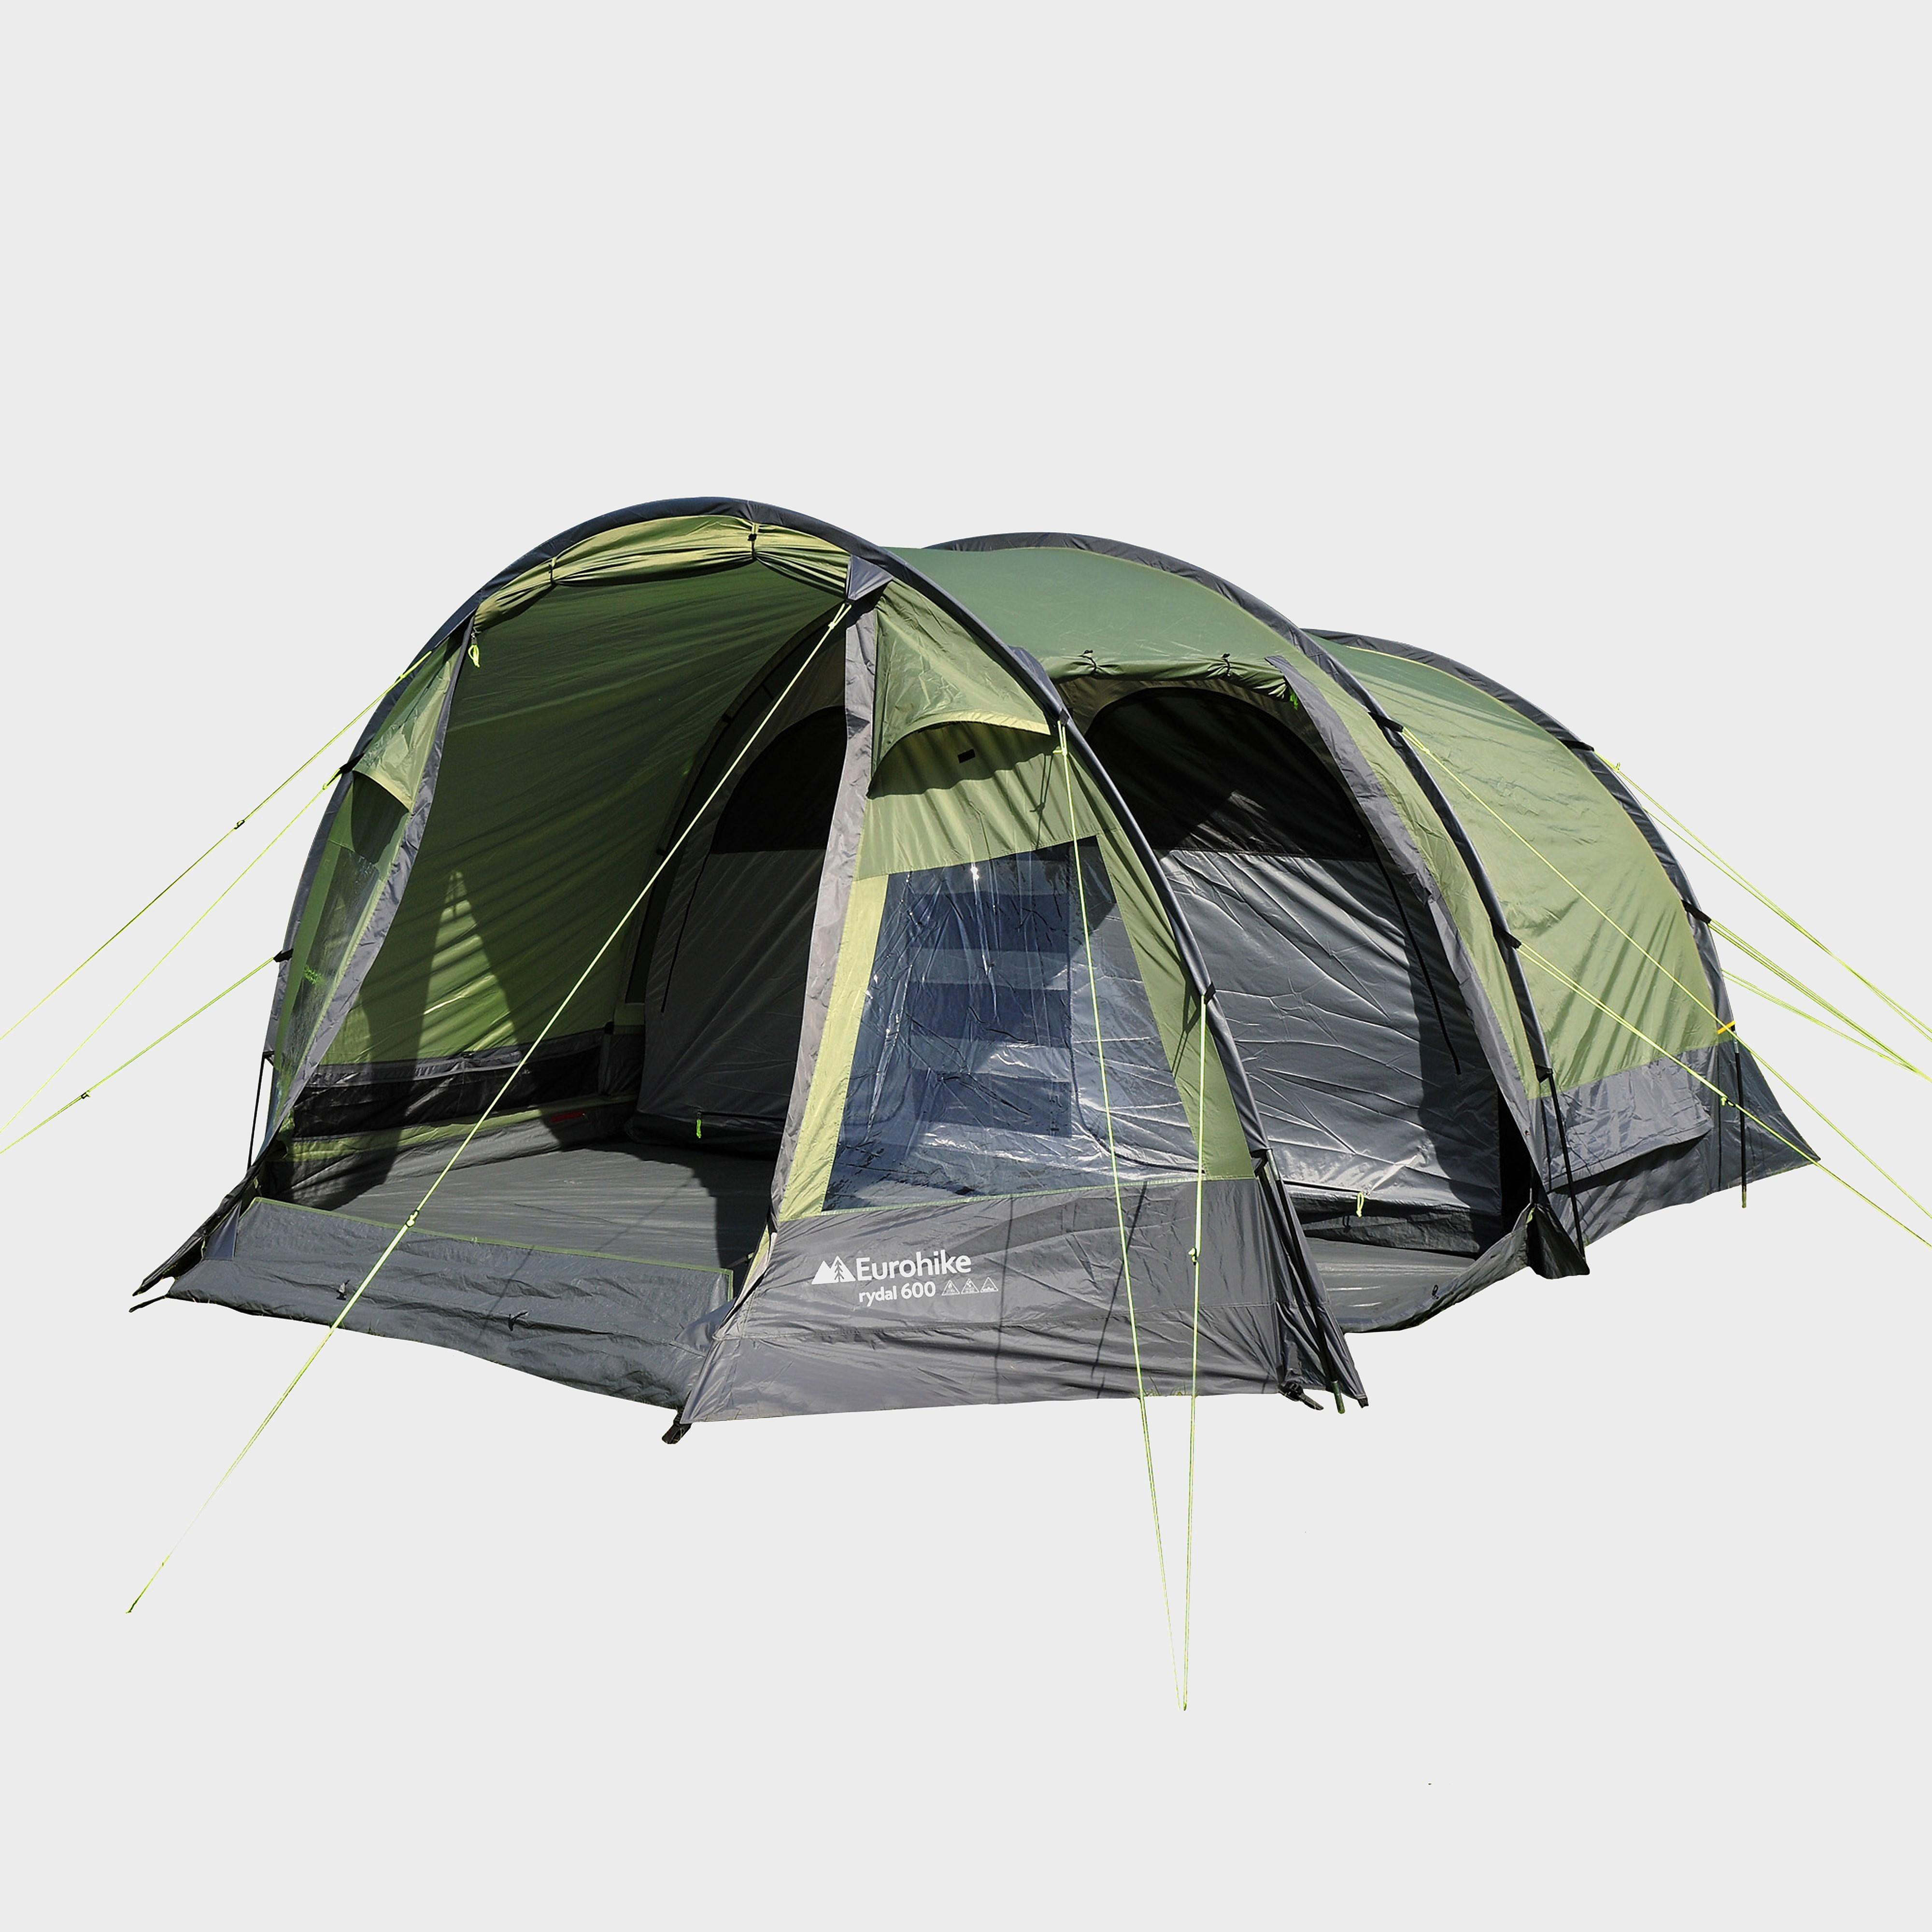 Eurohike Rydal 600 6 Man Tent